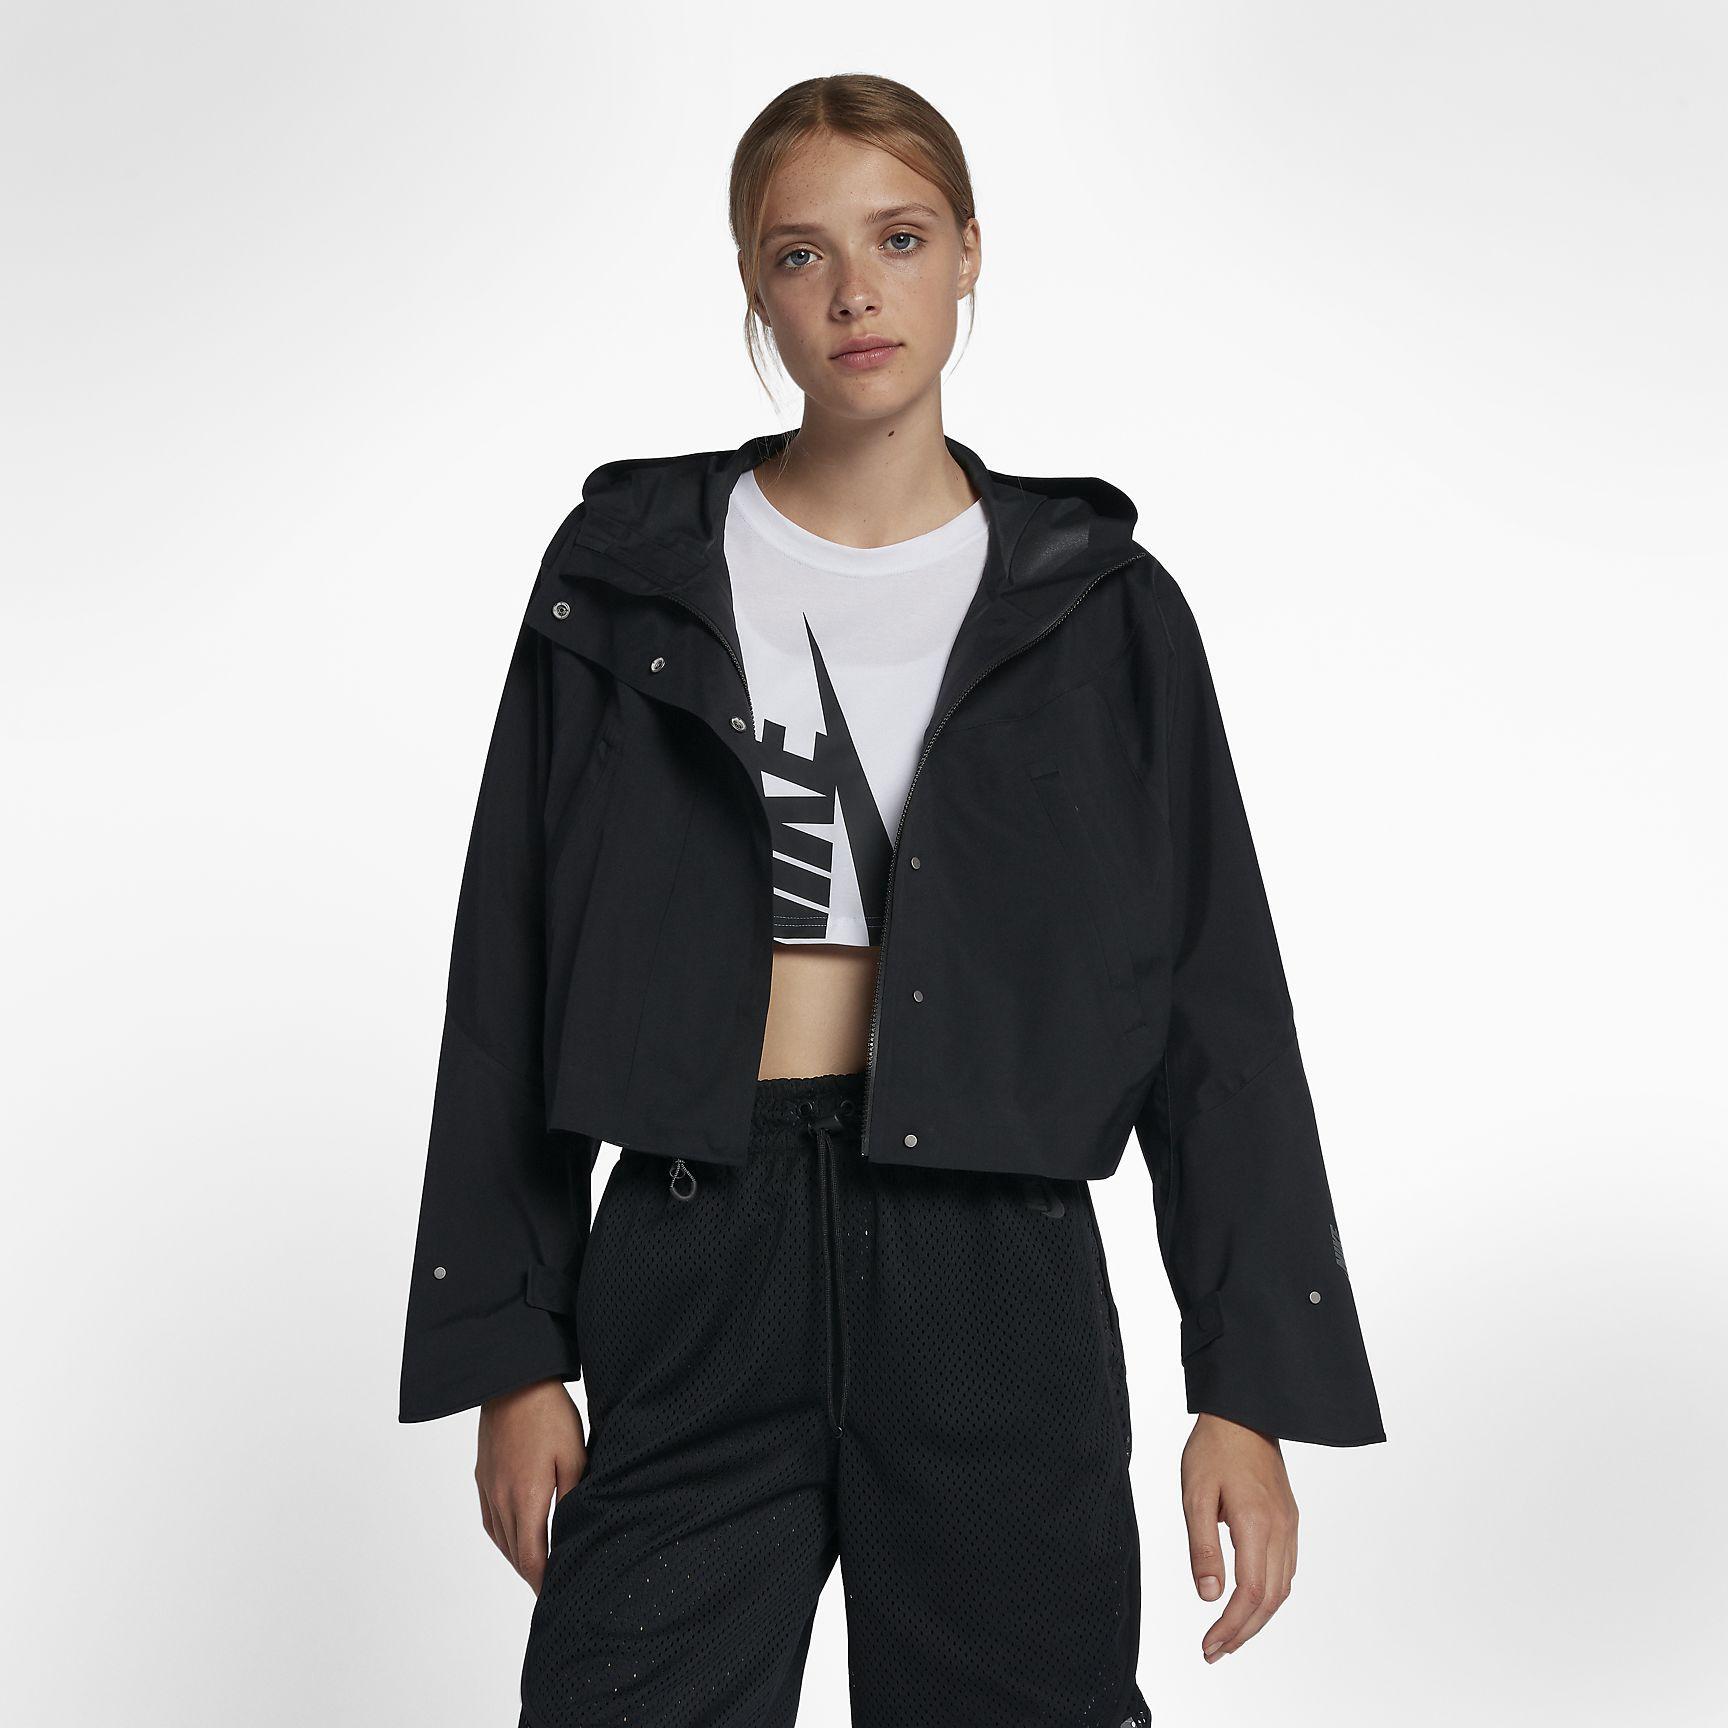 Veste Nike Femme Court Veste Femmes Vêtements |